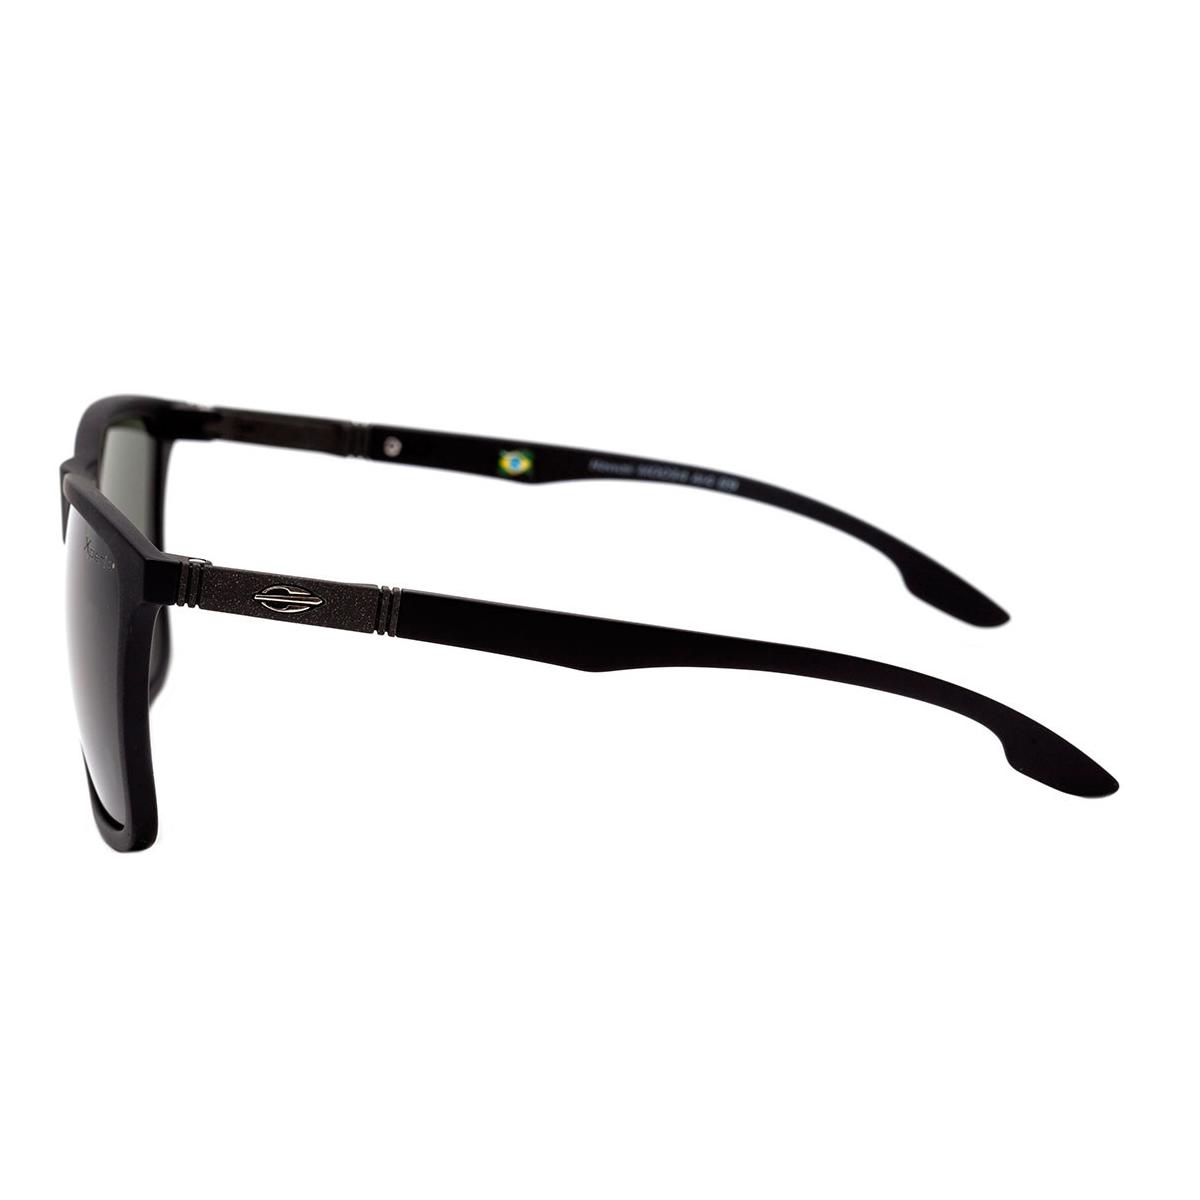 Óculos Mormaii Hawaii Preto Fosco  Lente G15 Polarizado ref M0034A1489 2727cf45c2